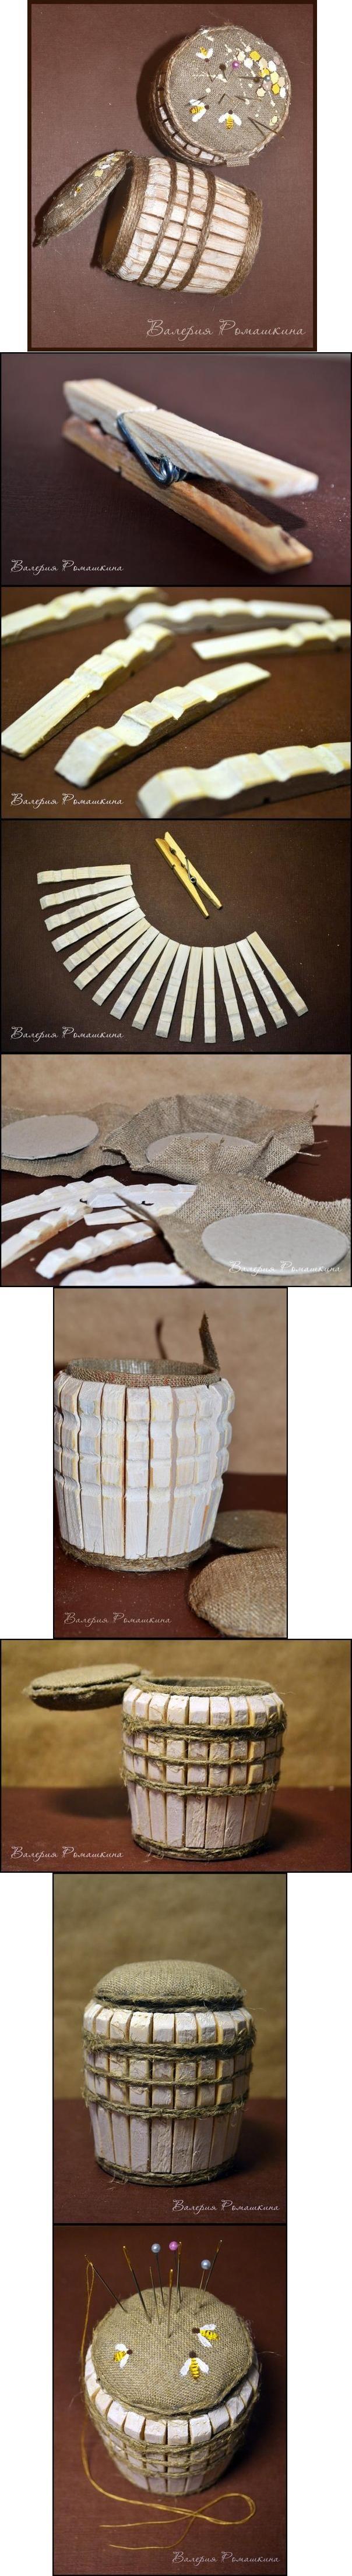 DIY Clothespin Barrel Pincushion DIY Clothespin Barrel Pincushion